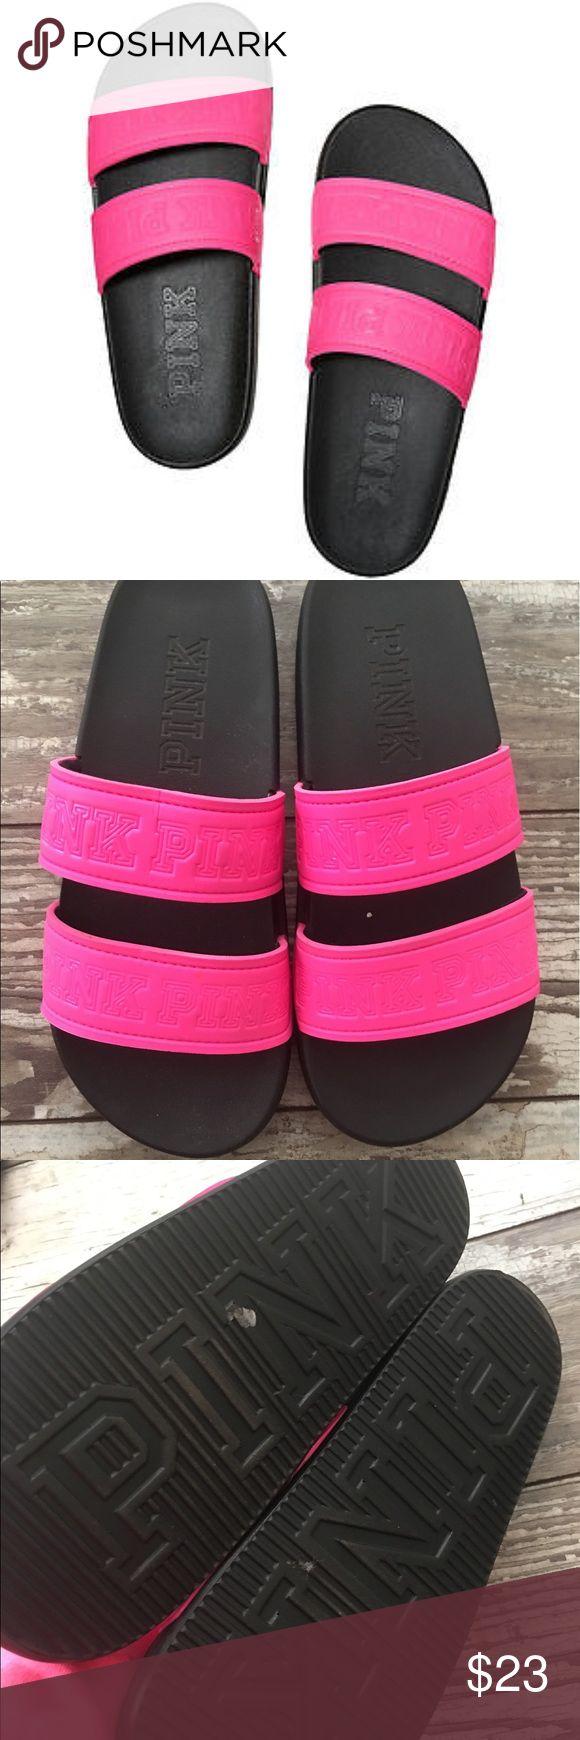 Sandals vs shoes - Vs Pink Slides Sandals Small 5 6 Cute Beach